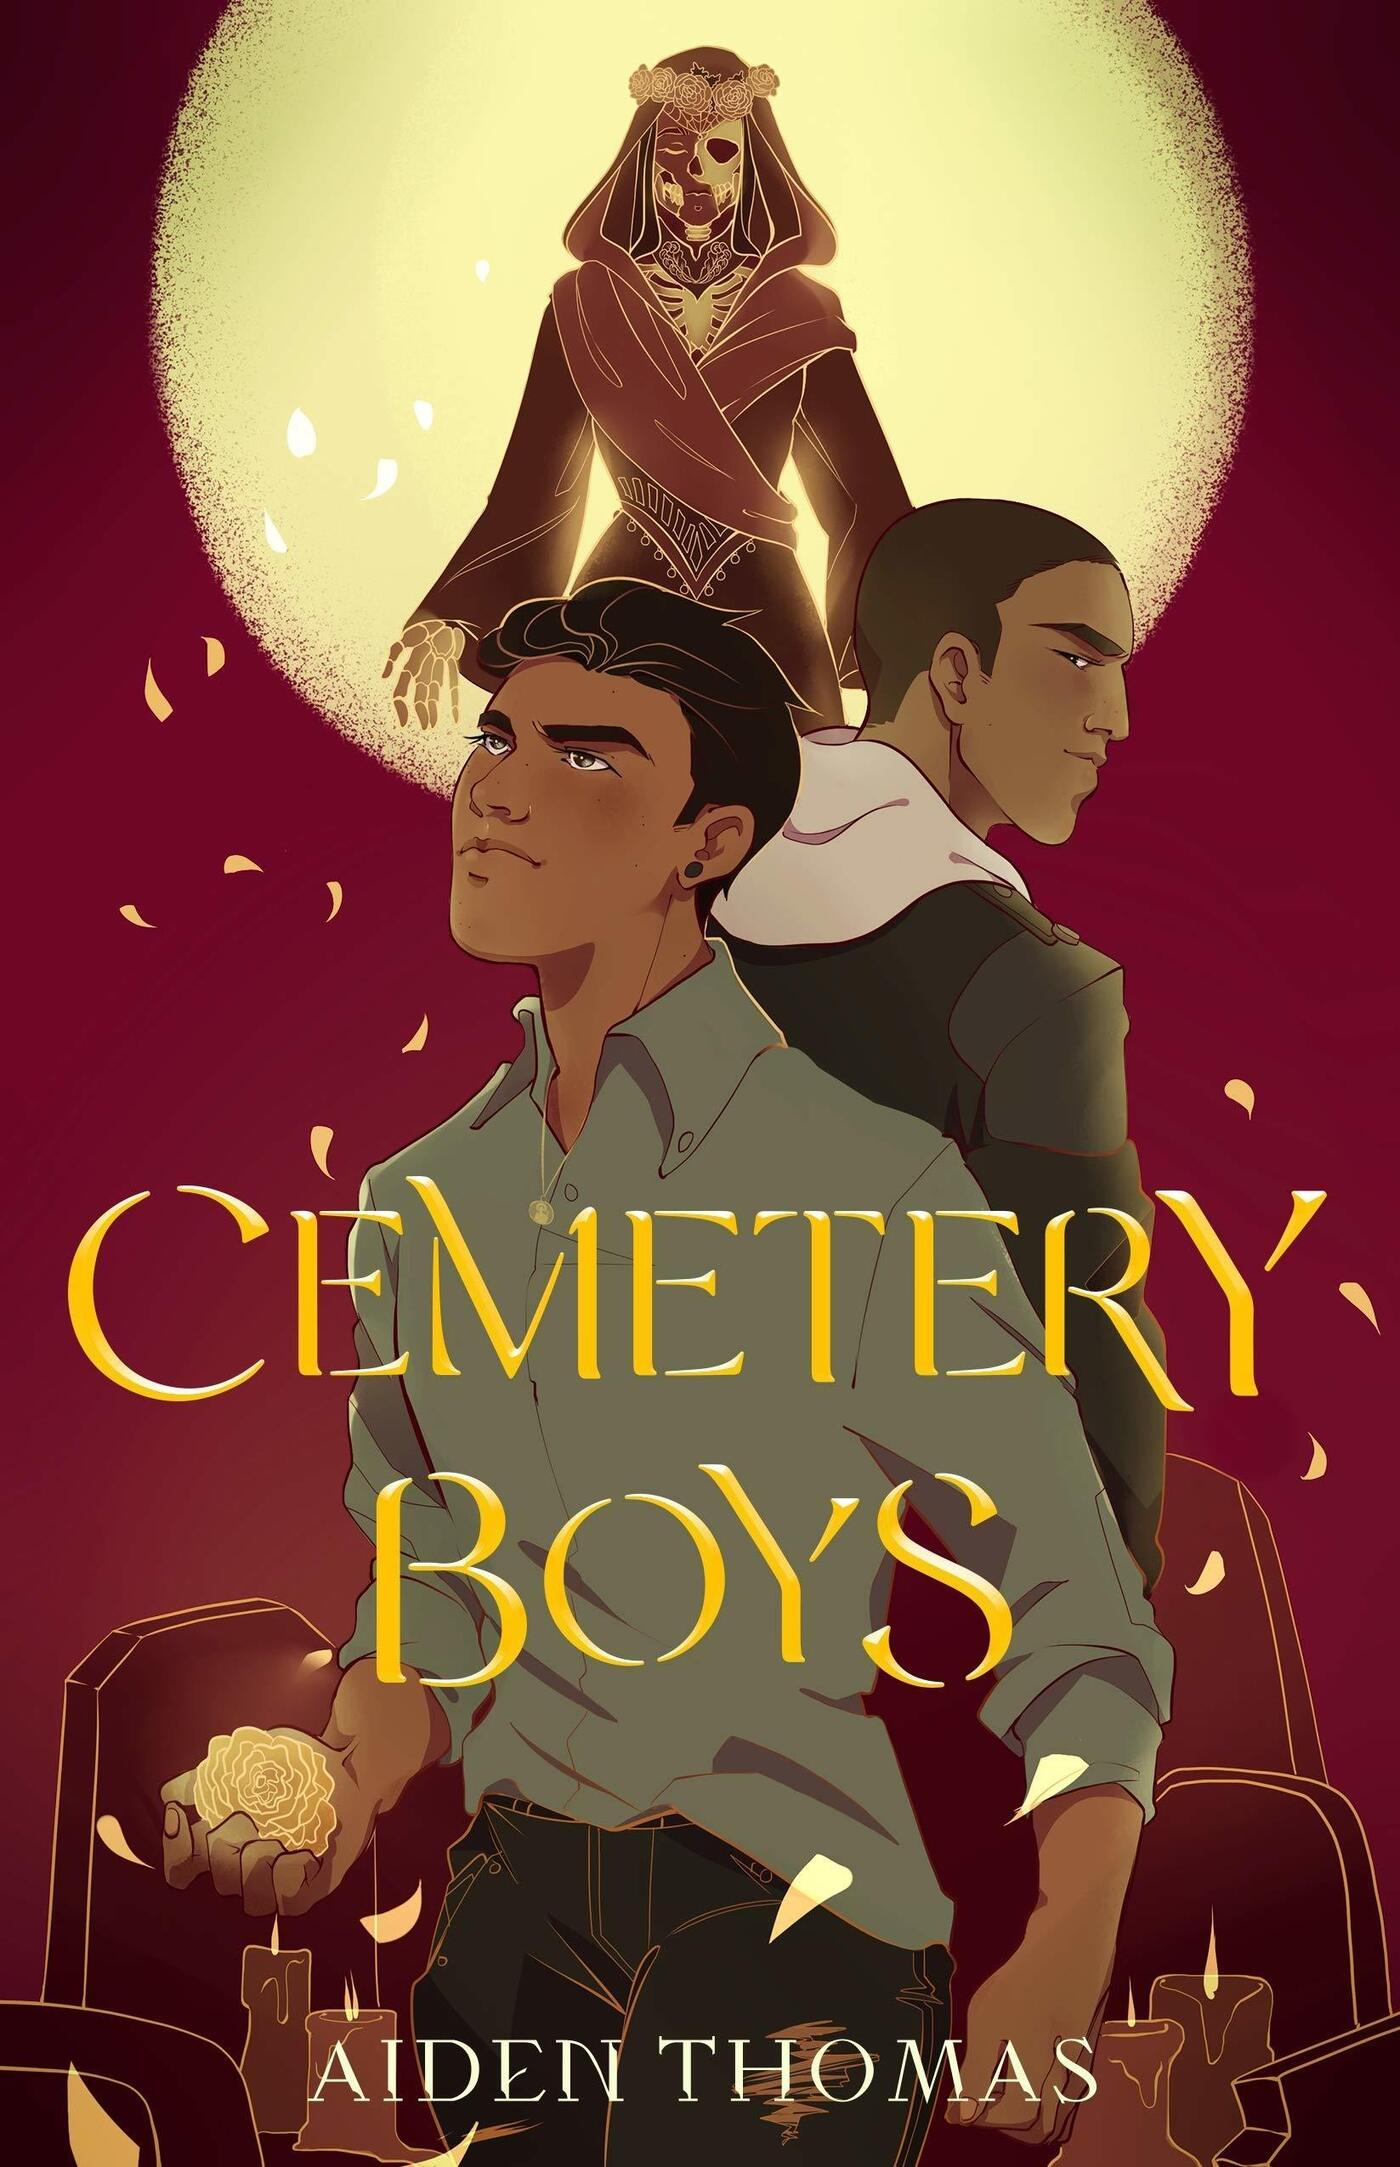 Cemetery Boys, by Aiden Thomas